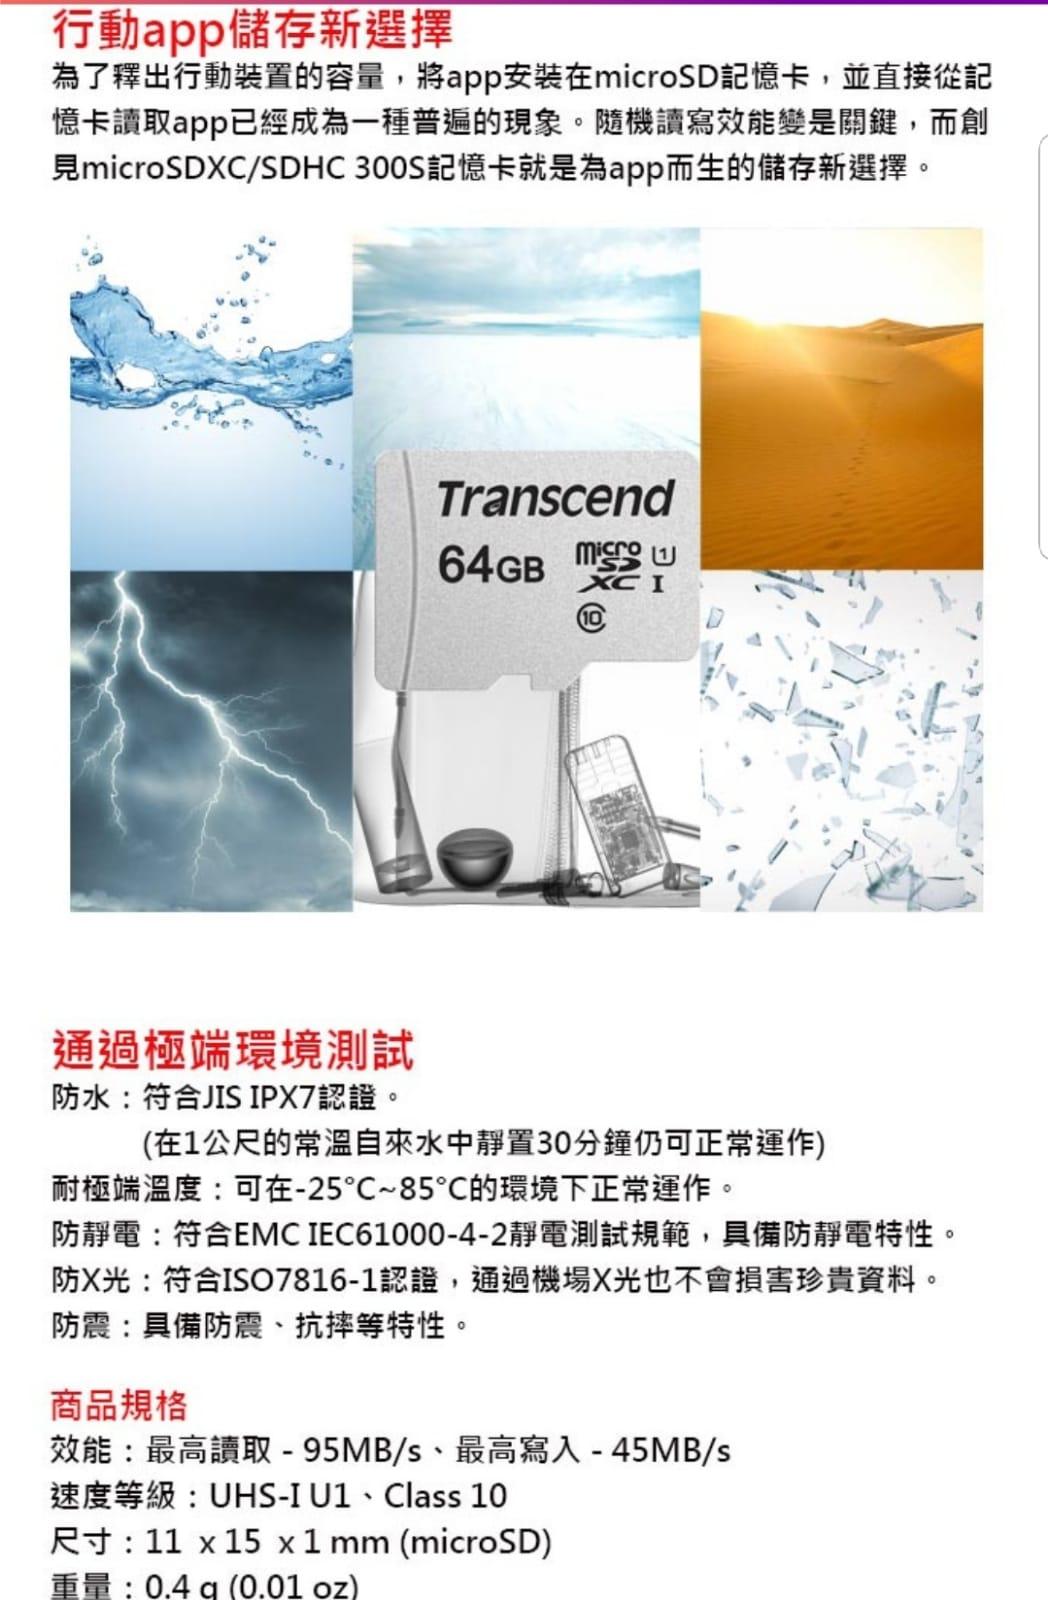 創見 300S 64GB U1 microSDHC UHS-I 記憶卡 (95MB / s) 3